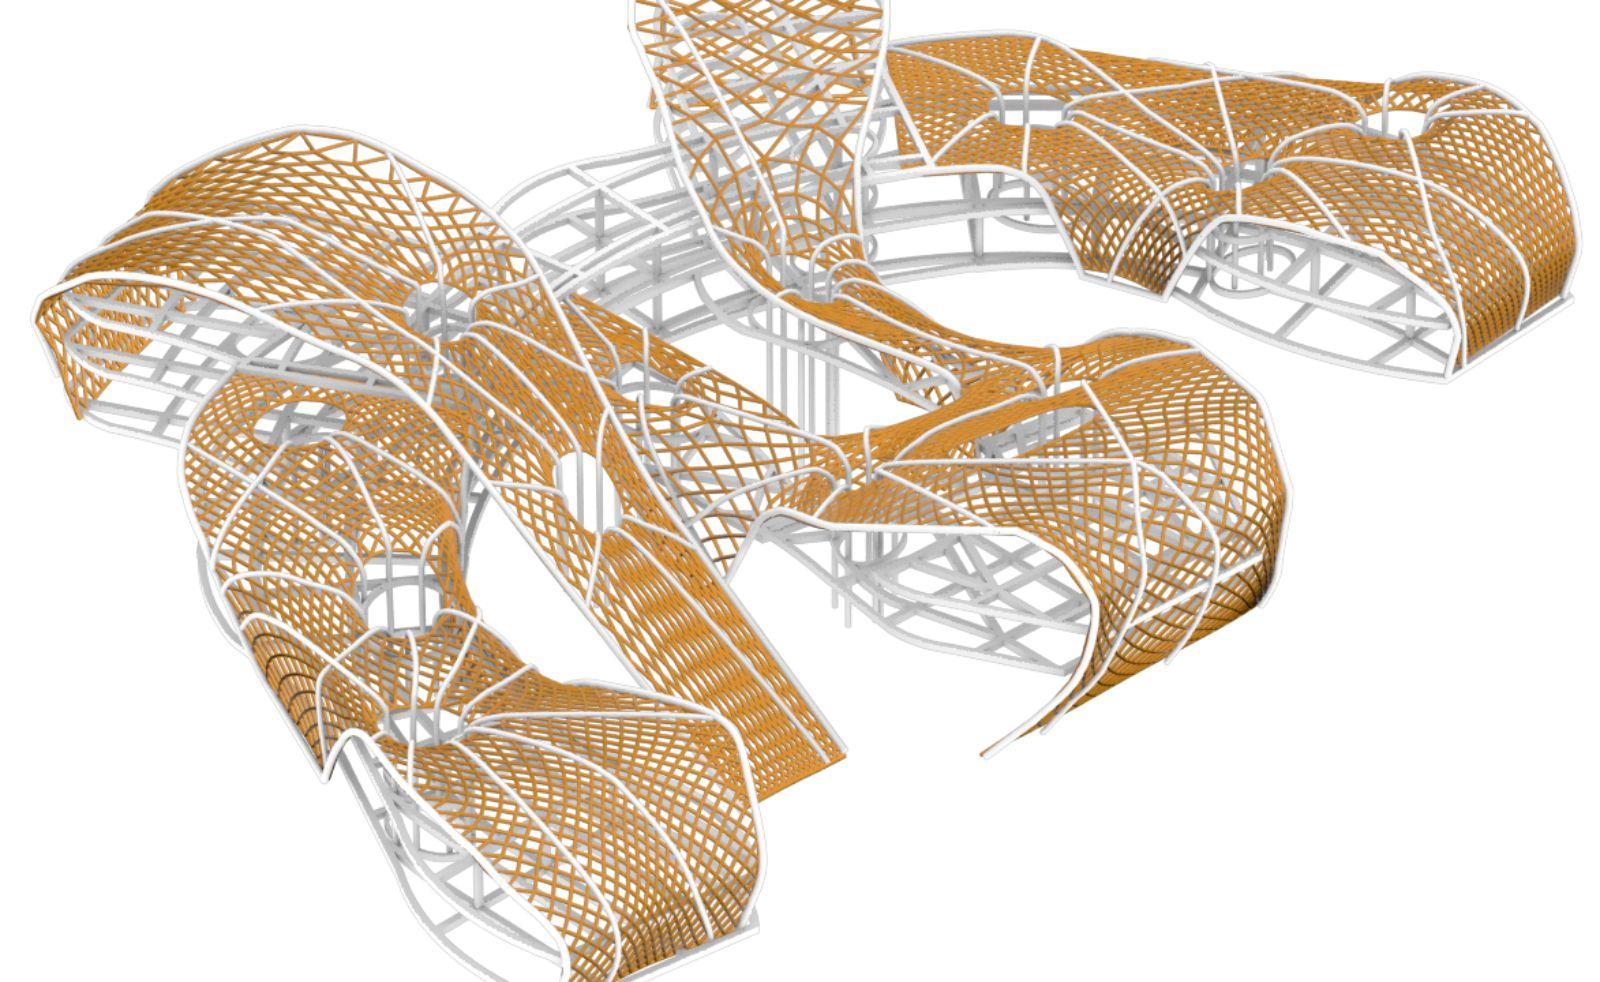 Interactive Complex of Alternative Energies